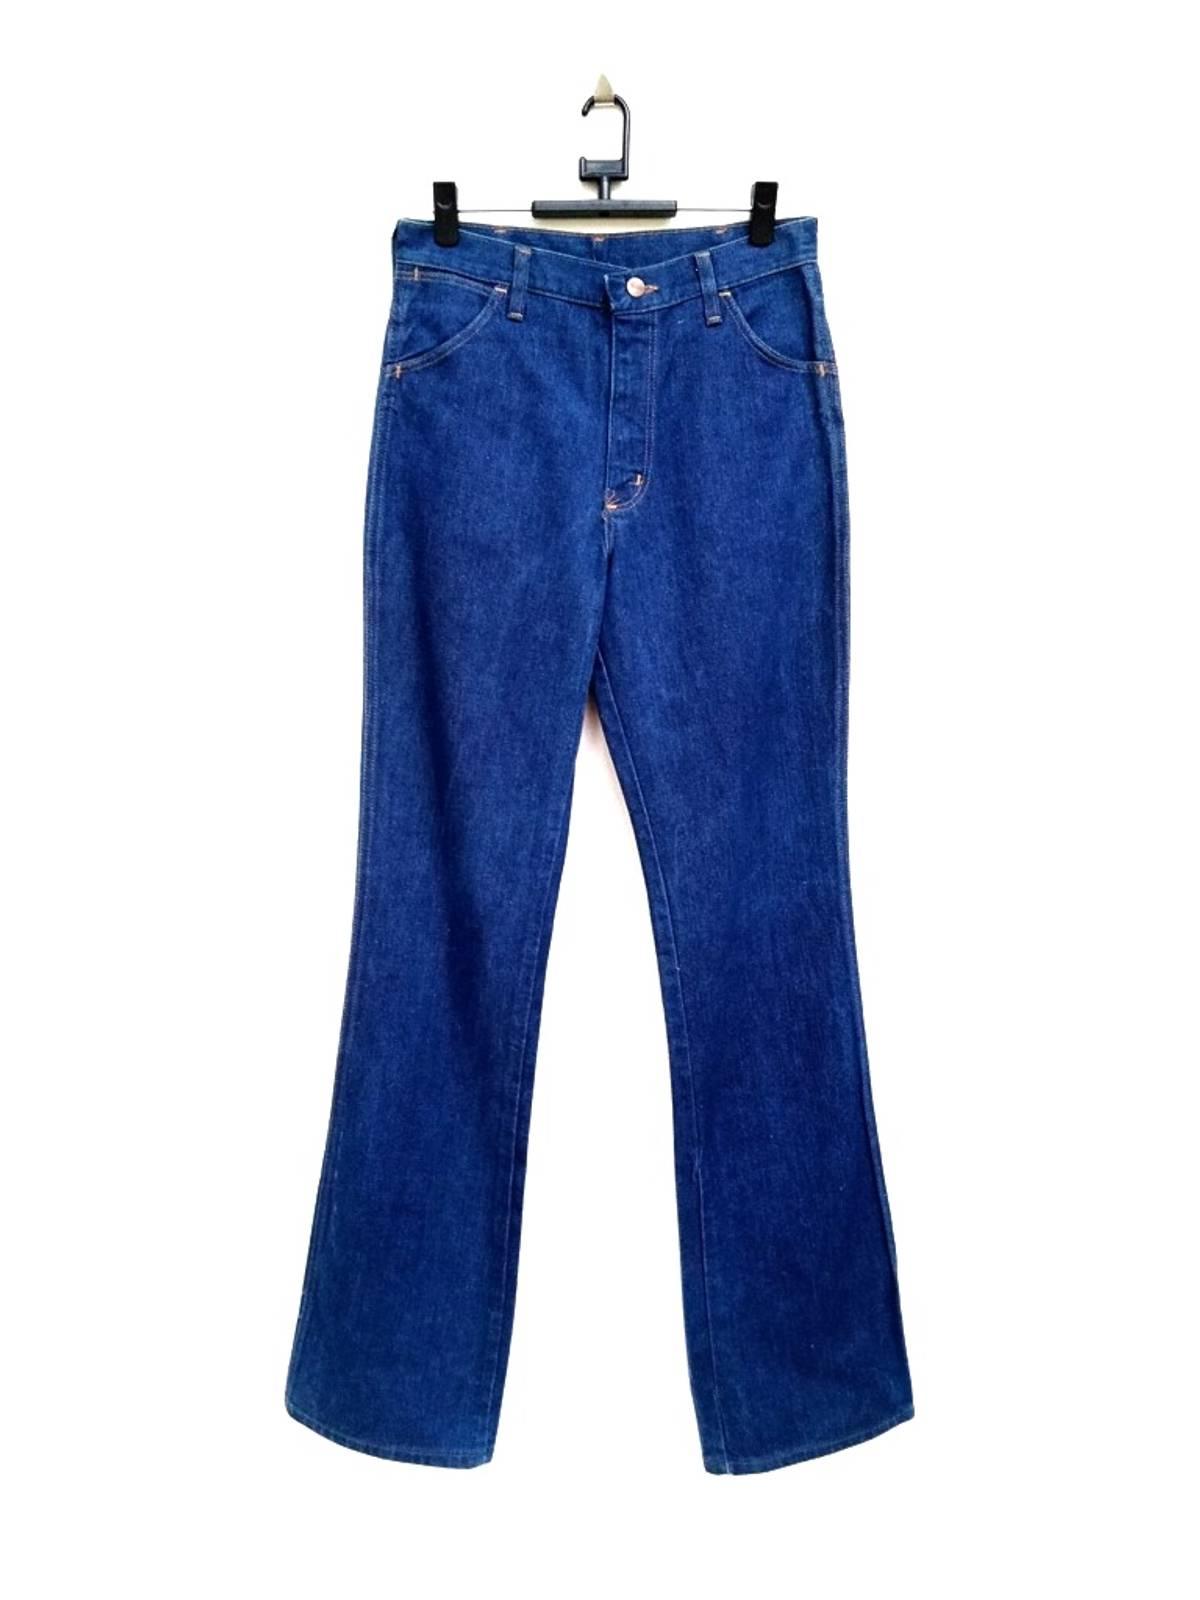 vintage 70s wrangler talon zipper up custom drawn cut off blue jean daisy duke shorts made in usa w31